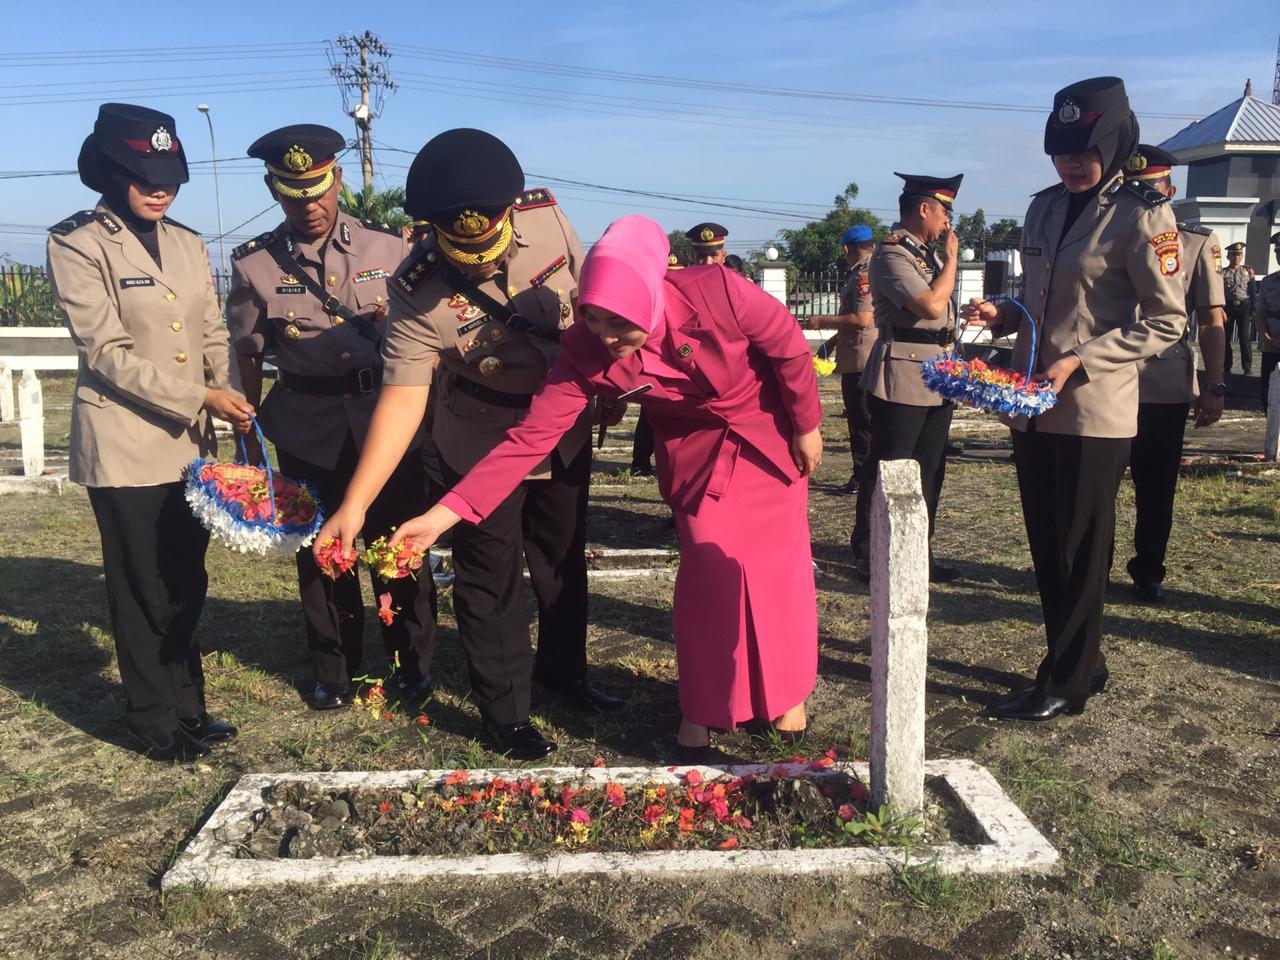 Sambut HUT Bhayangkara, Polres Wajo Ziarah ke Taman Makam Pahlawan Empagae